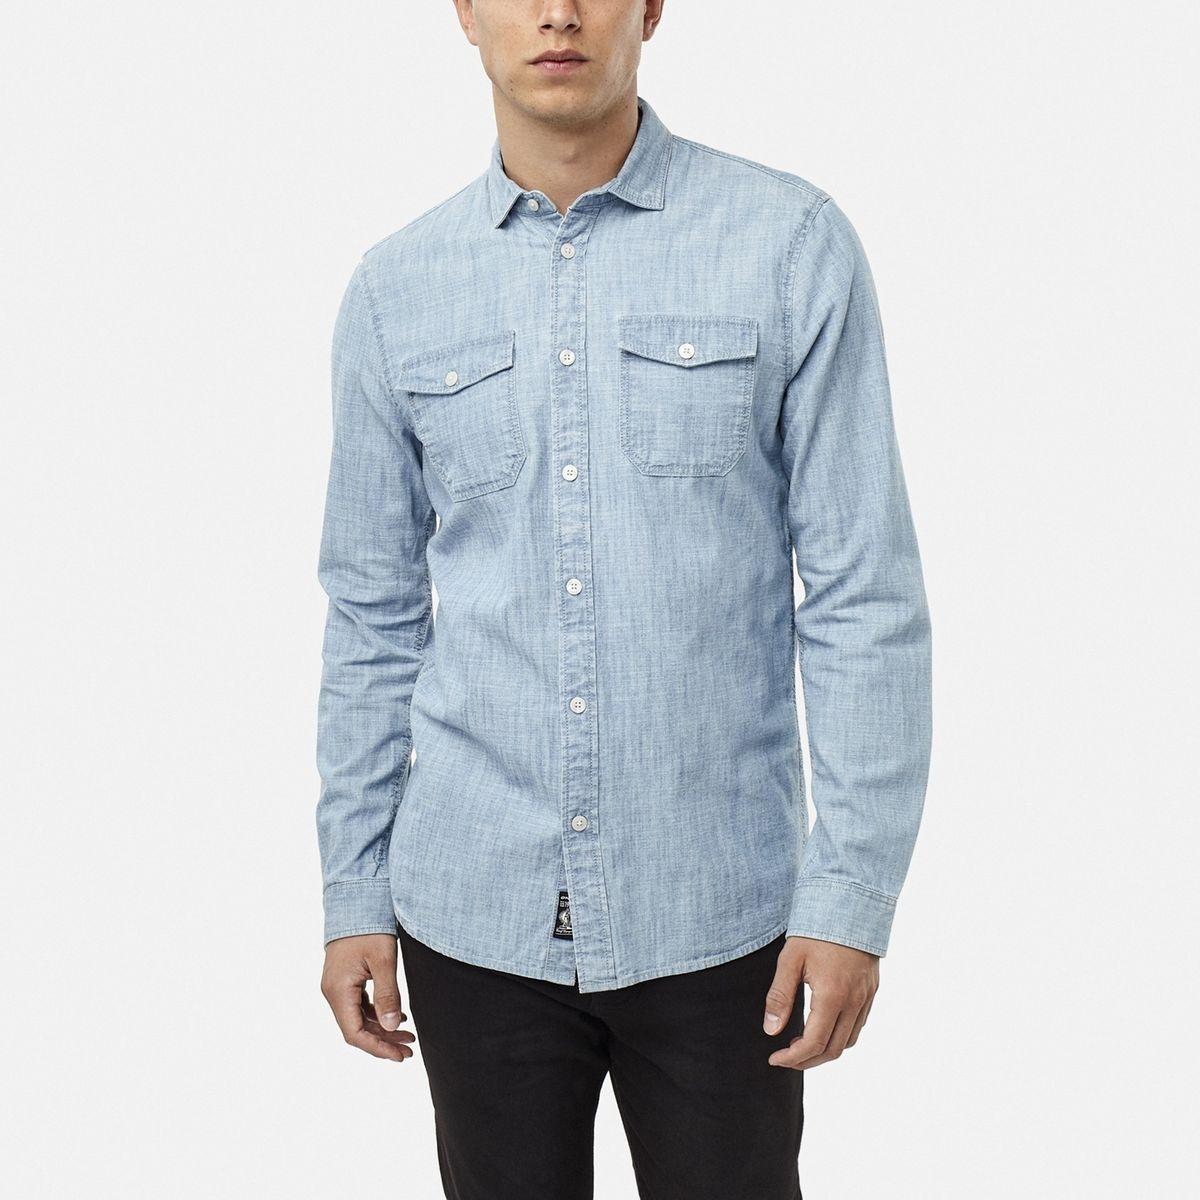 Chemises manches longues Jack's Chambray Chemises manches longues